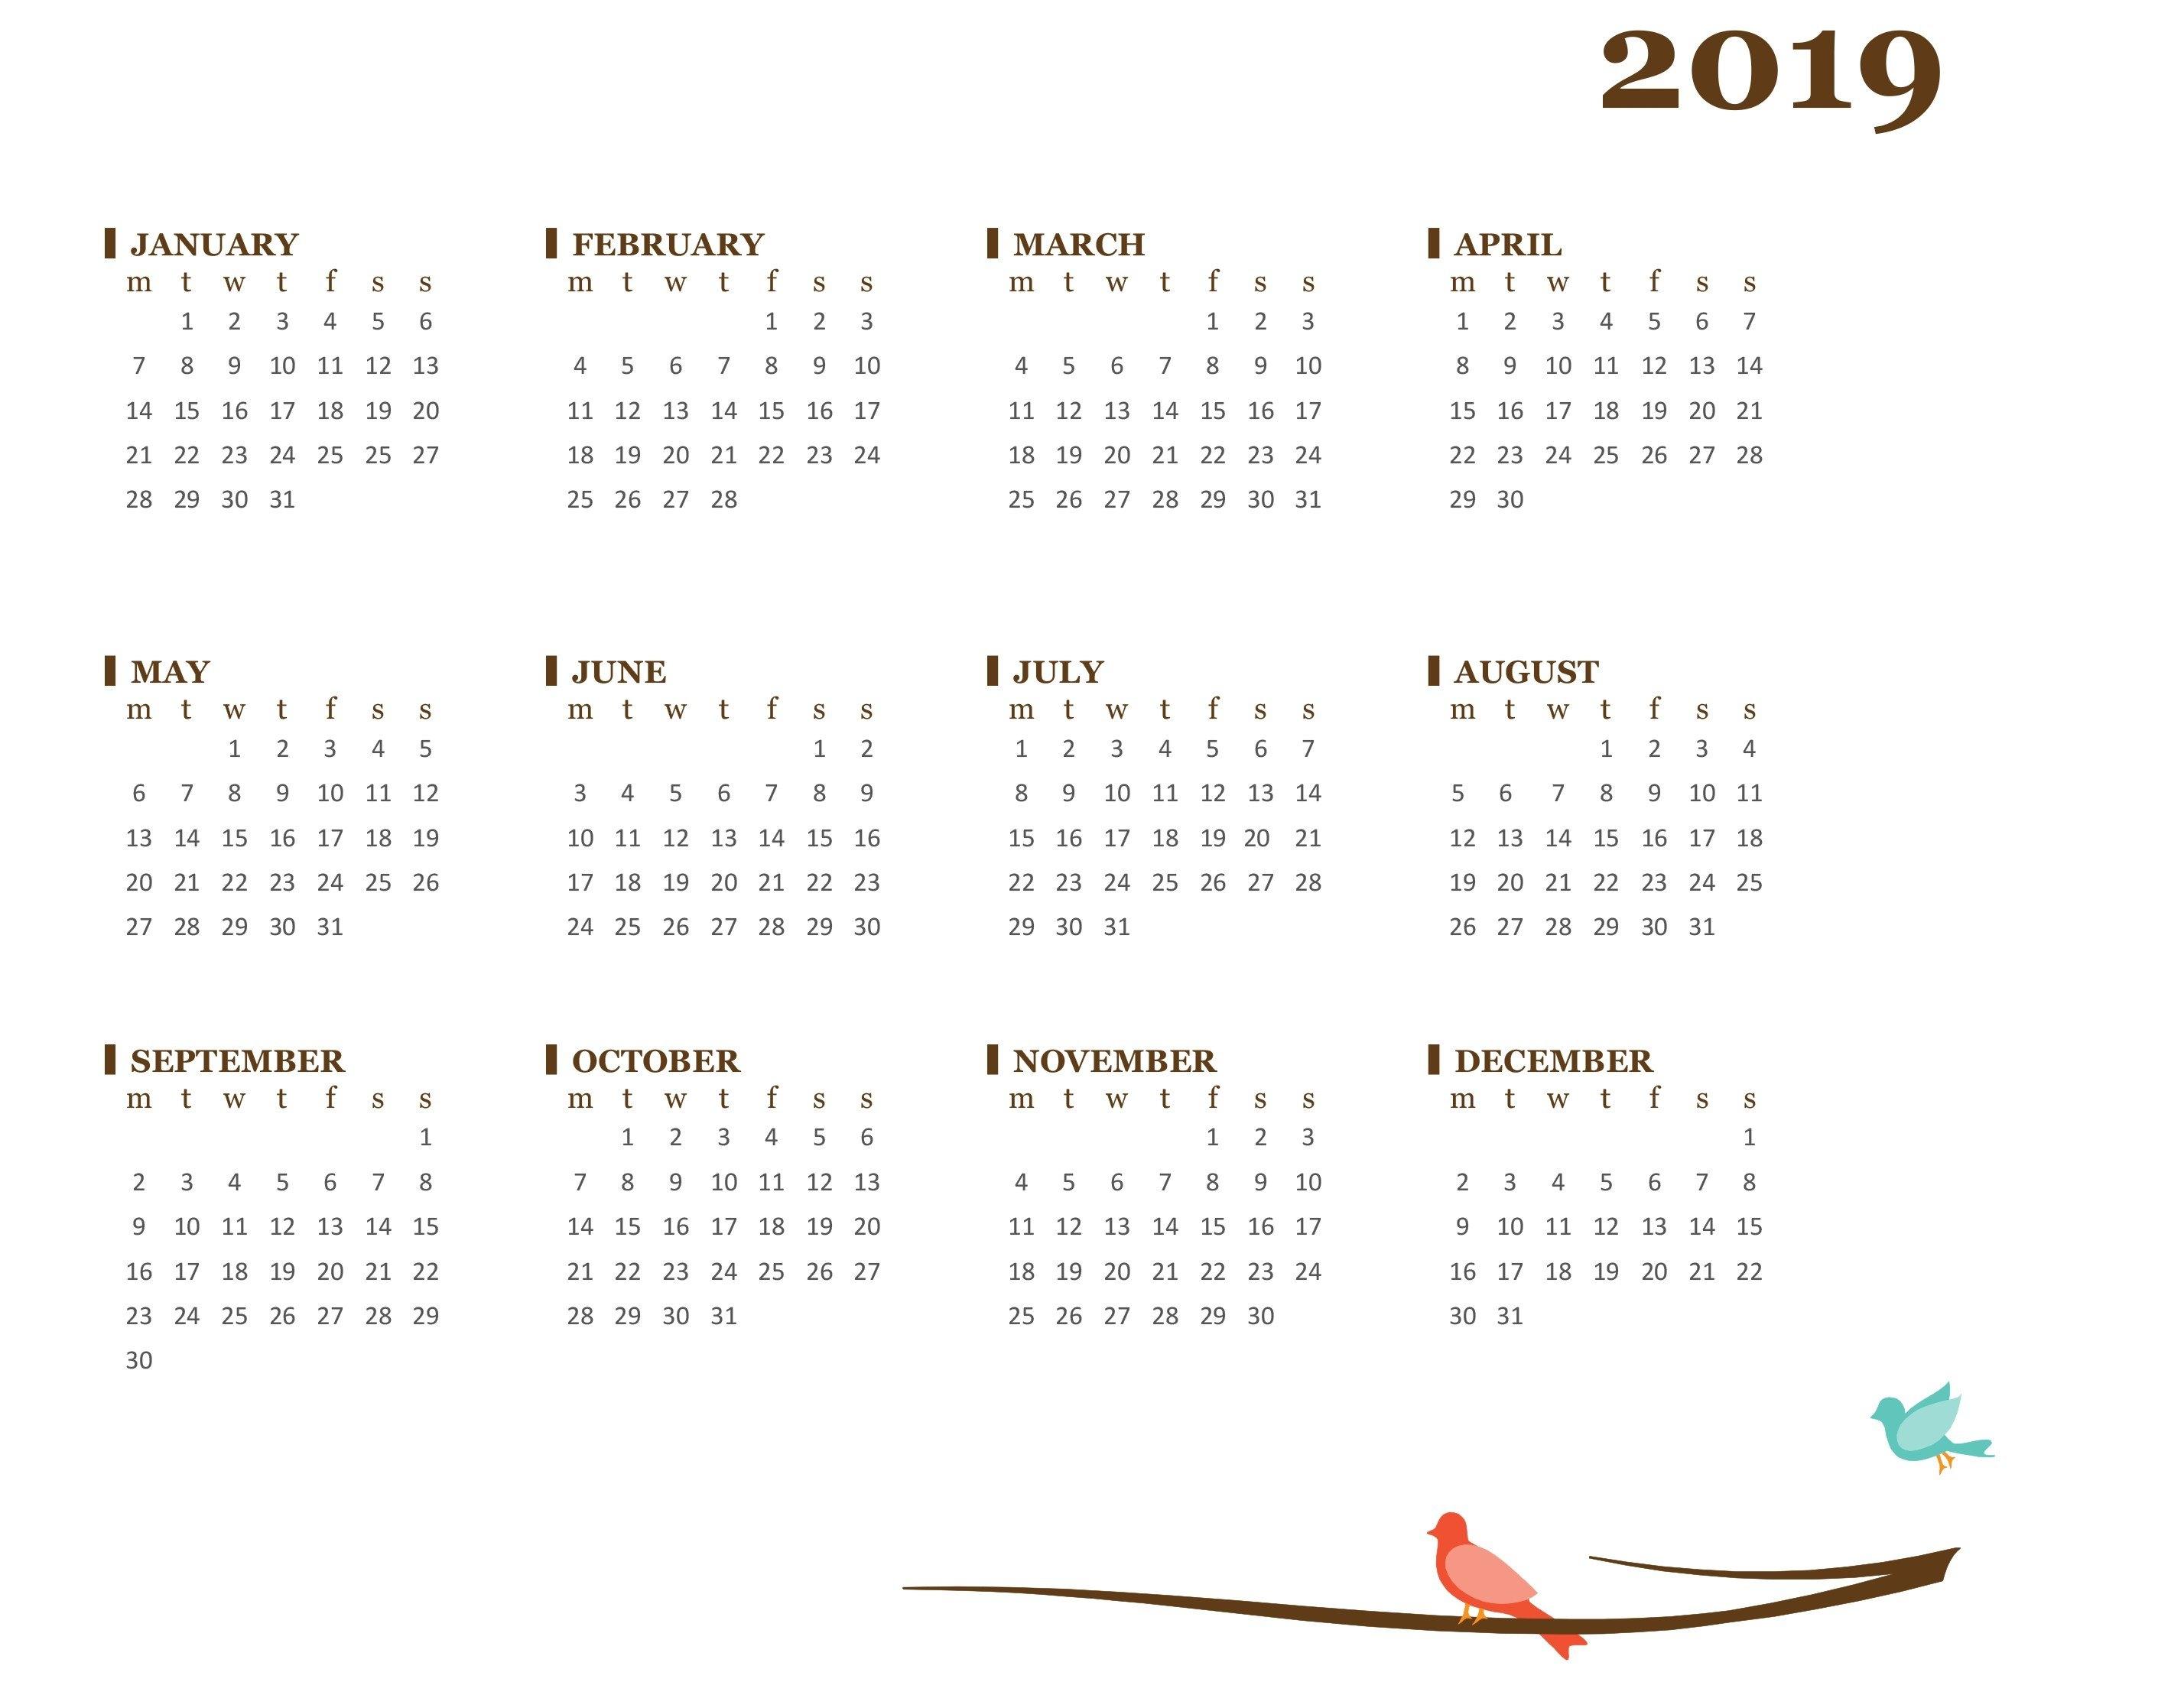 2019 Yearly Calendar (Mon Sun) Calendar 2019 Picture